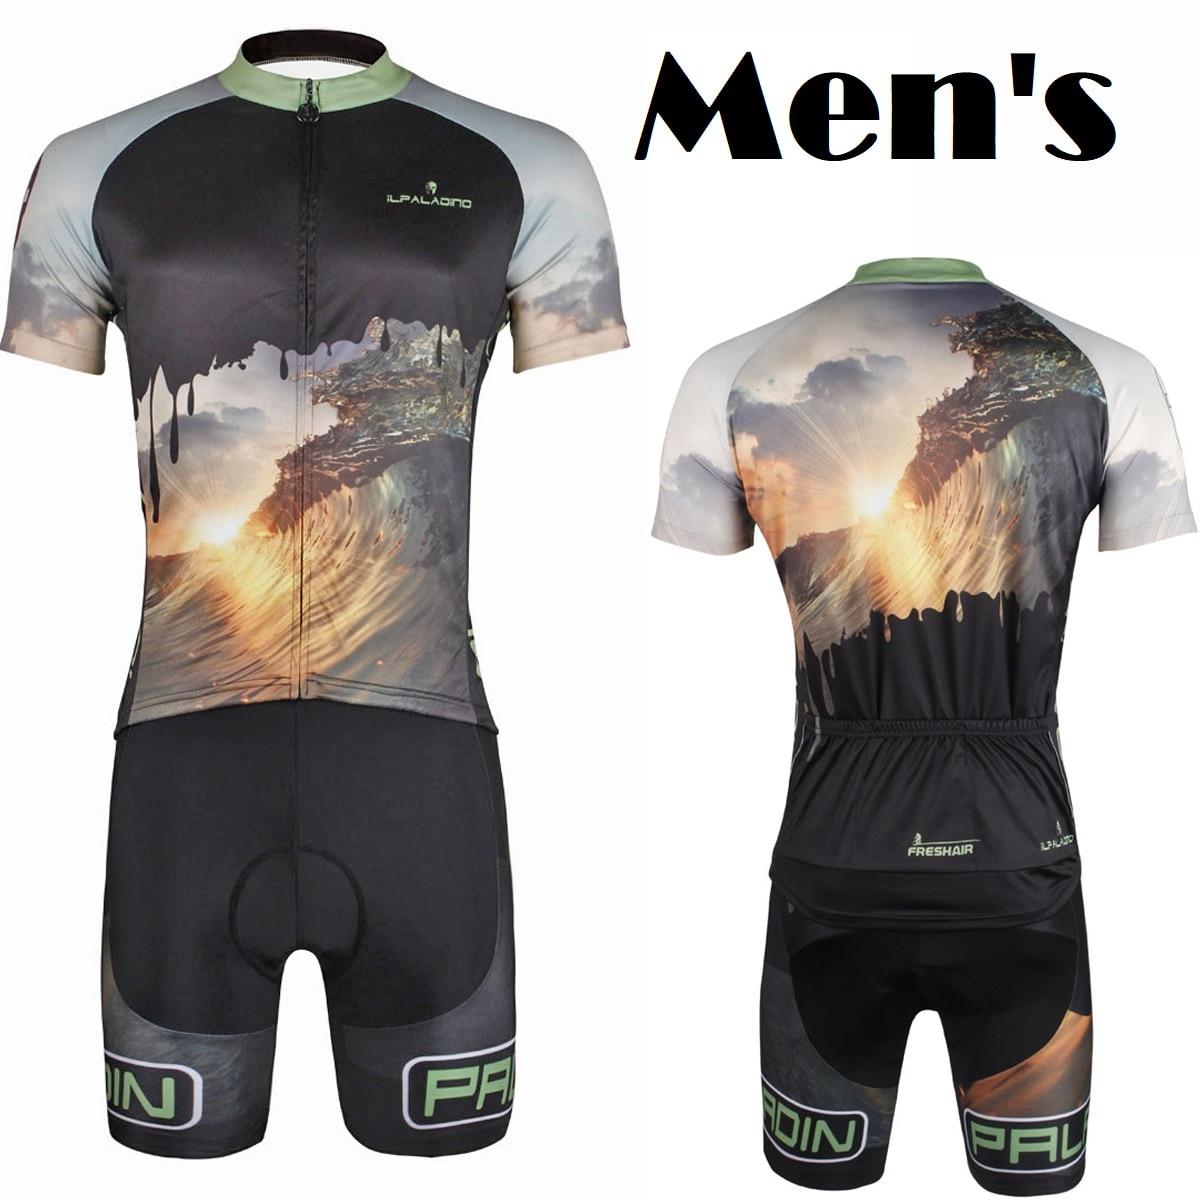 Short Sleeve Cycling Jerseys 2017 Team Cycling Suit Racing Jersey BIB Pro Sportswear Free Shipping ILPALADINO QI17DT752